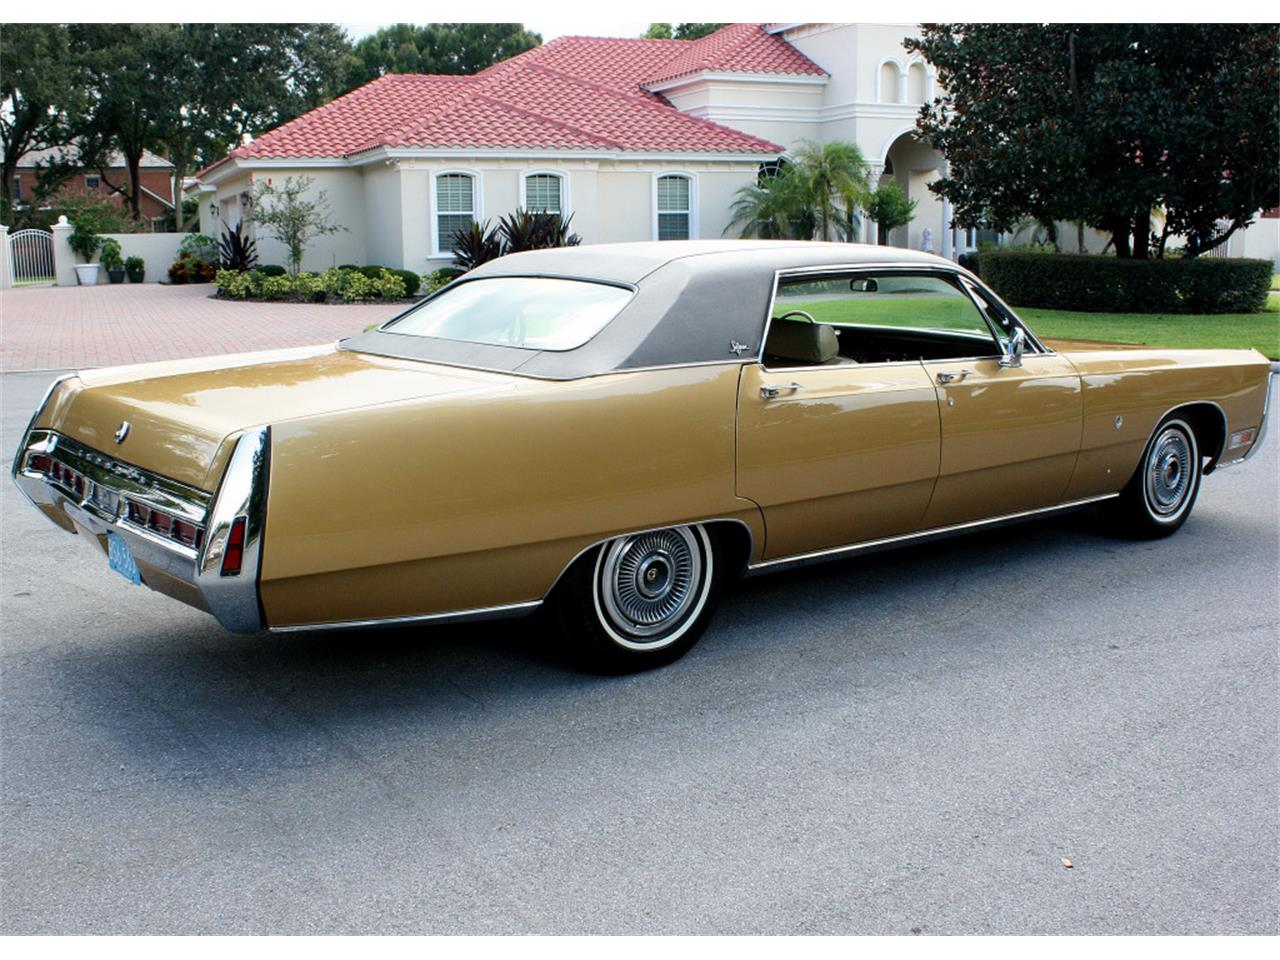 1970 Chrysler Imperial for sale in Lakeland, FL ...